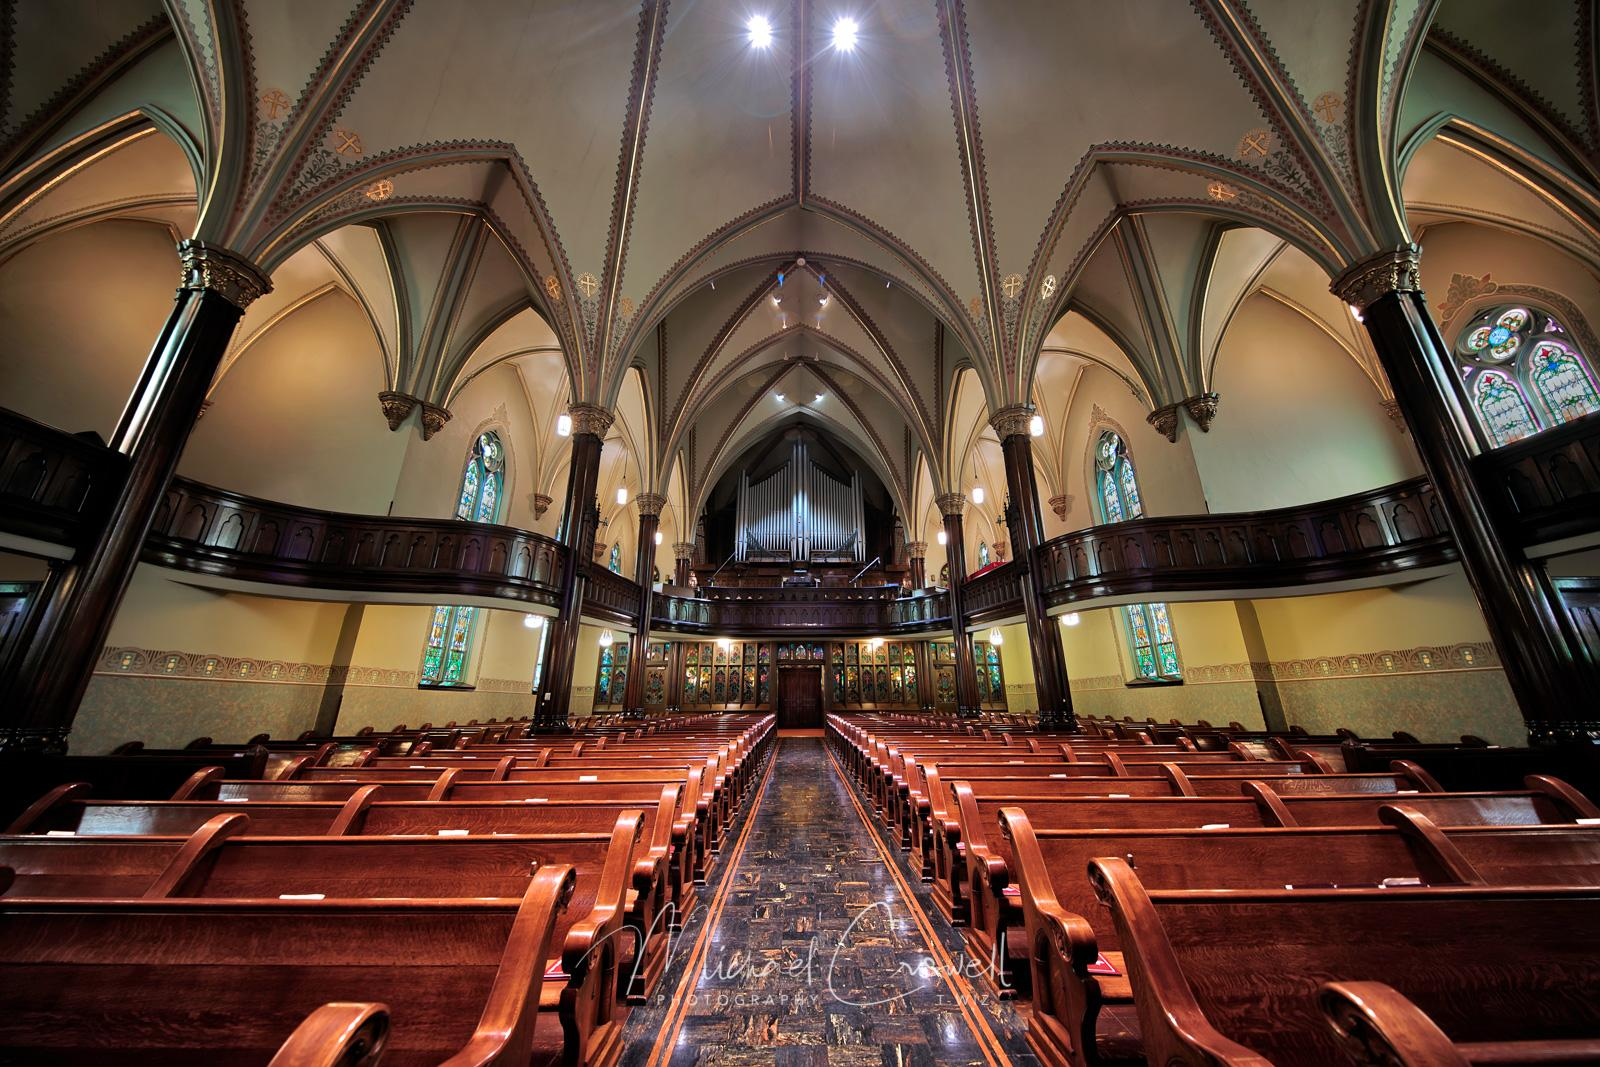 St Paul's Evangelical and Big Bertha